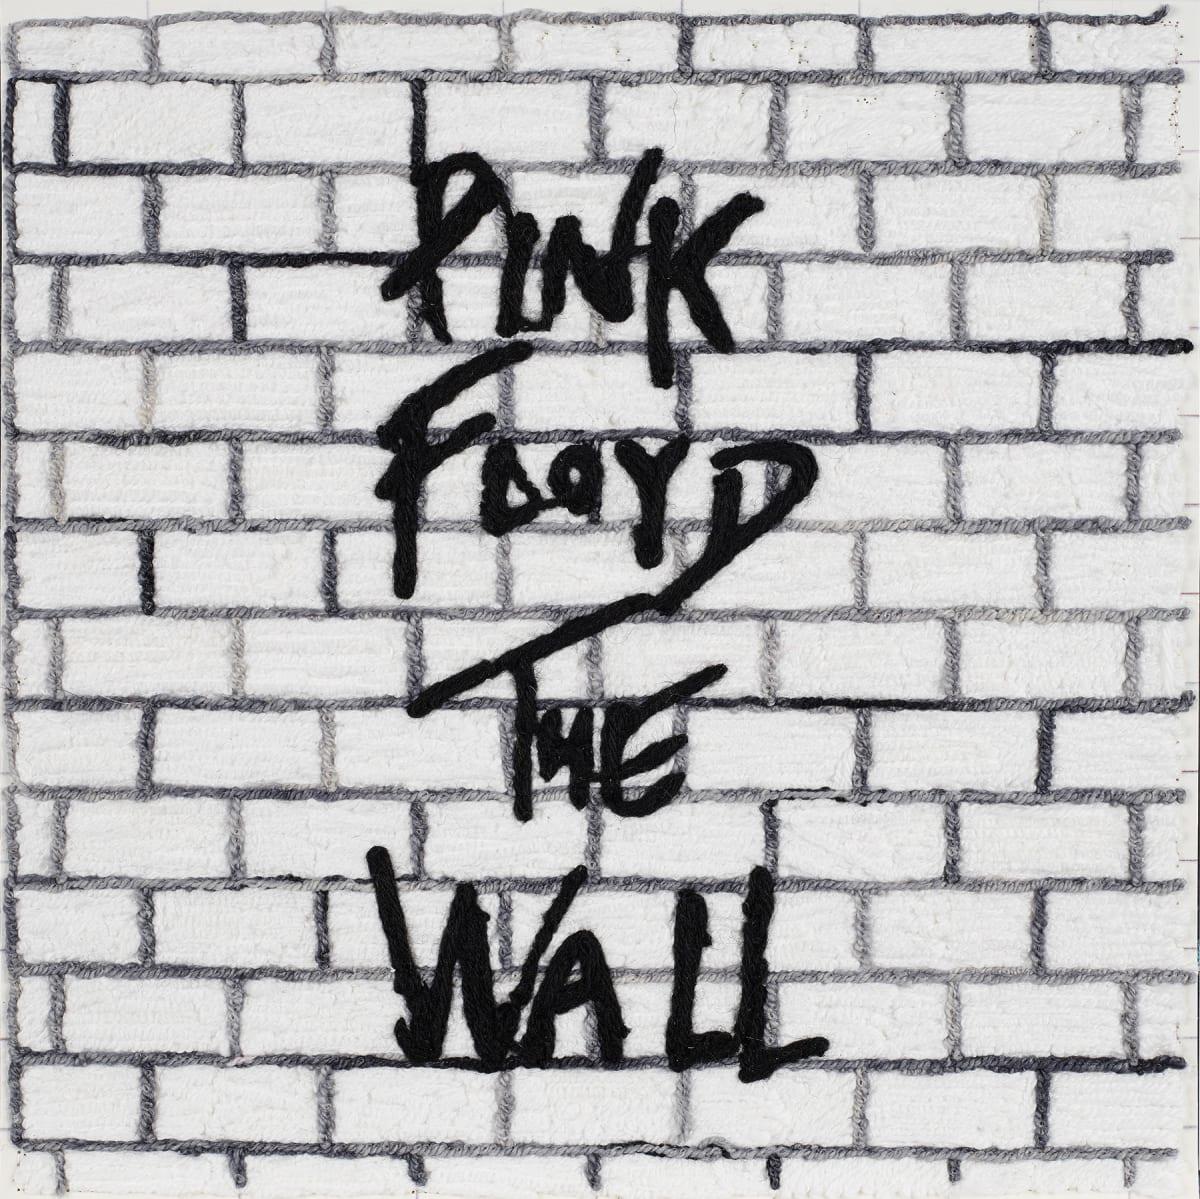 Stephen Wilson, The Wall, Pink Floyd , 2019